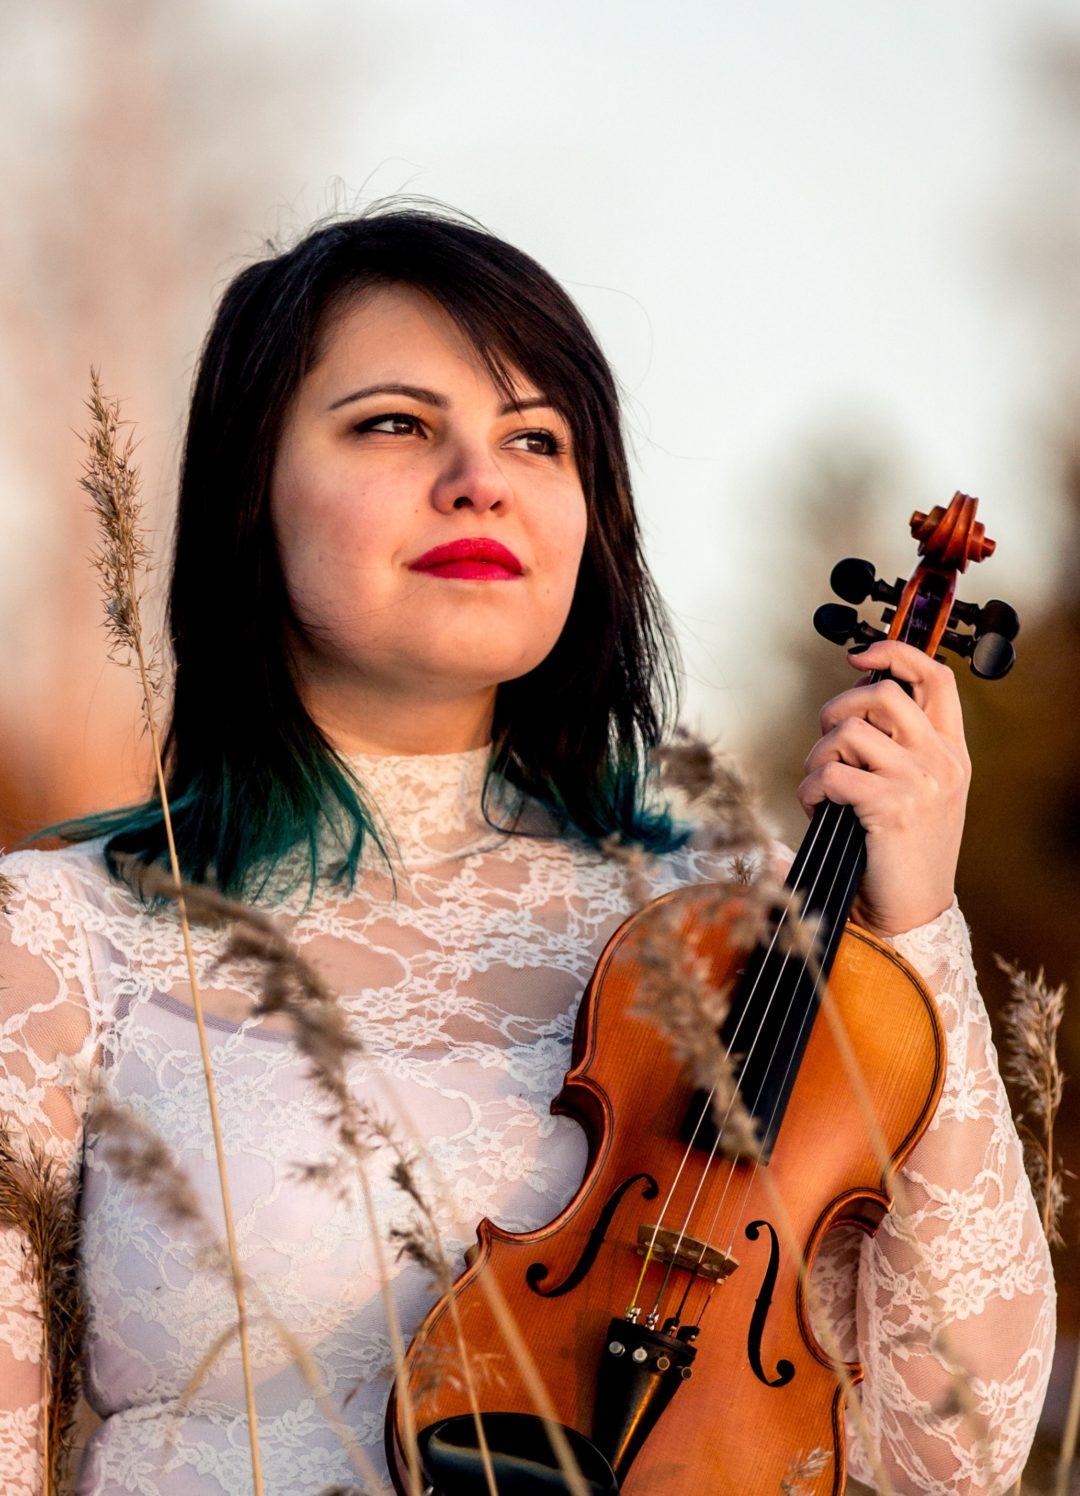 Maria Vojtovicova